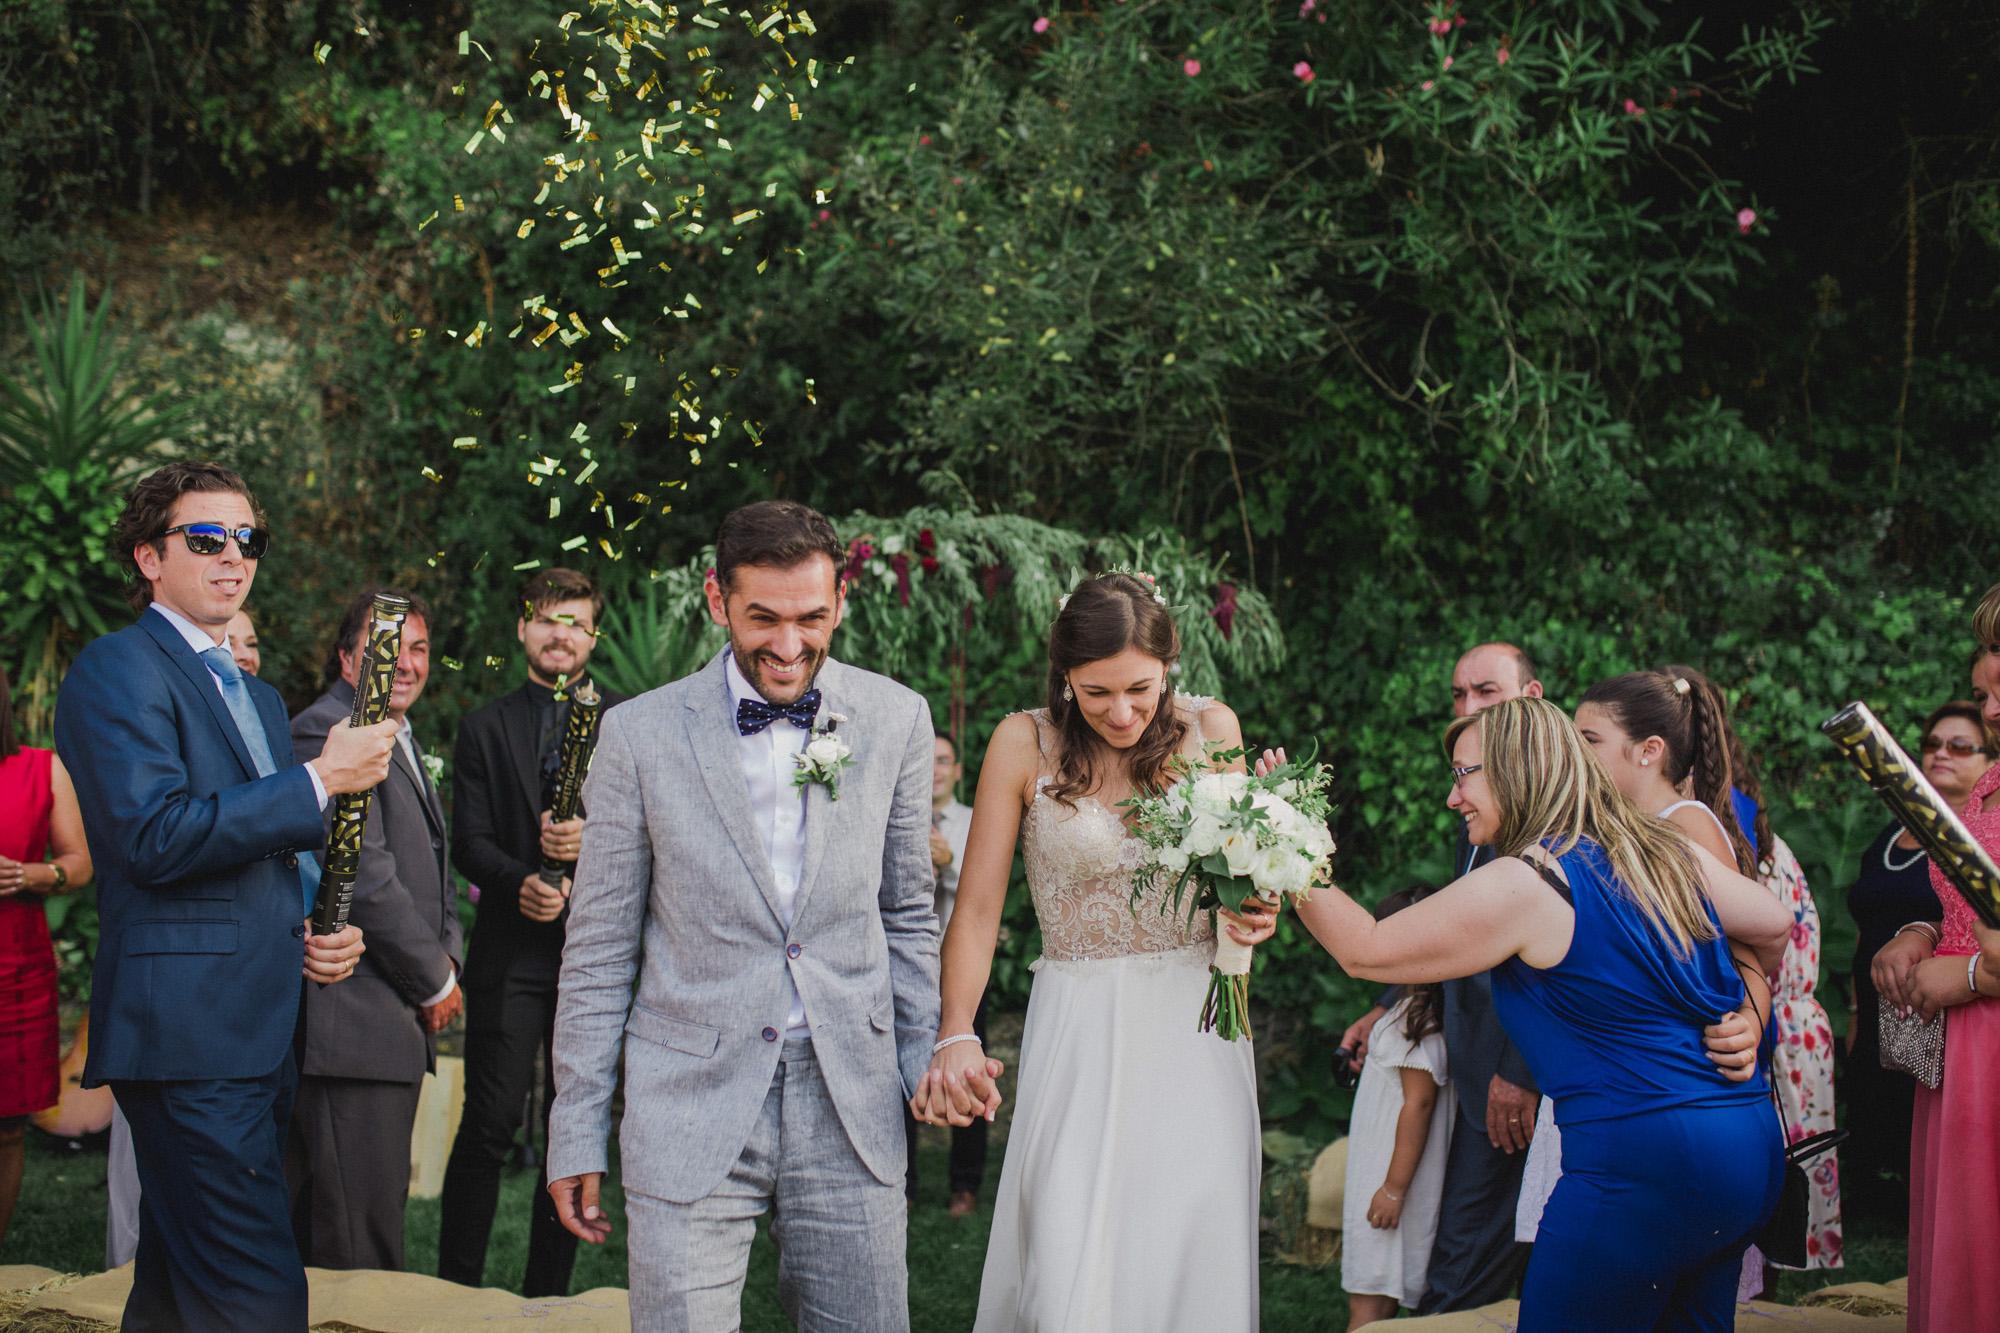 043-carina-e-samuel-wedding-casamento-quinta-dos-rouxinois-rustico-my-fancy-wedding-mafra-malveira-lisboa-sintra-cascais-filipe-santiago-fotografia-fotografo-lifestyle-destination-portugal